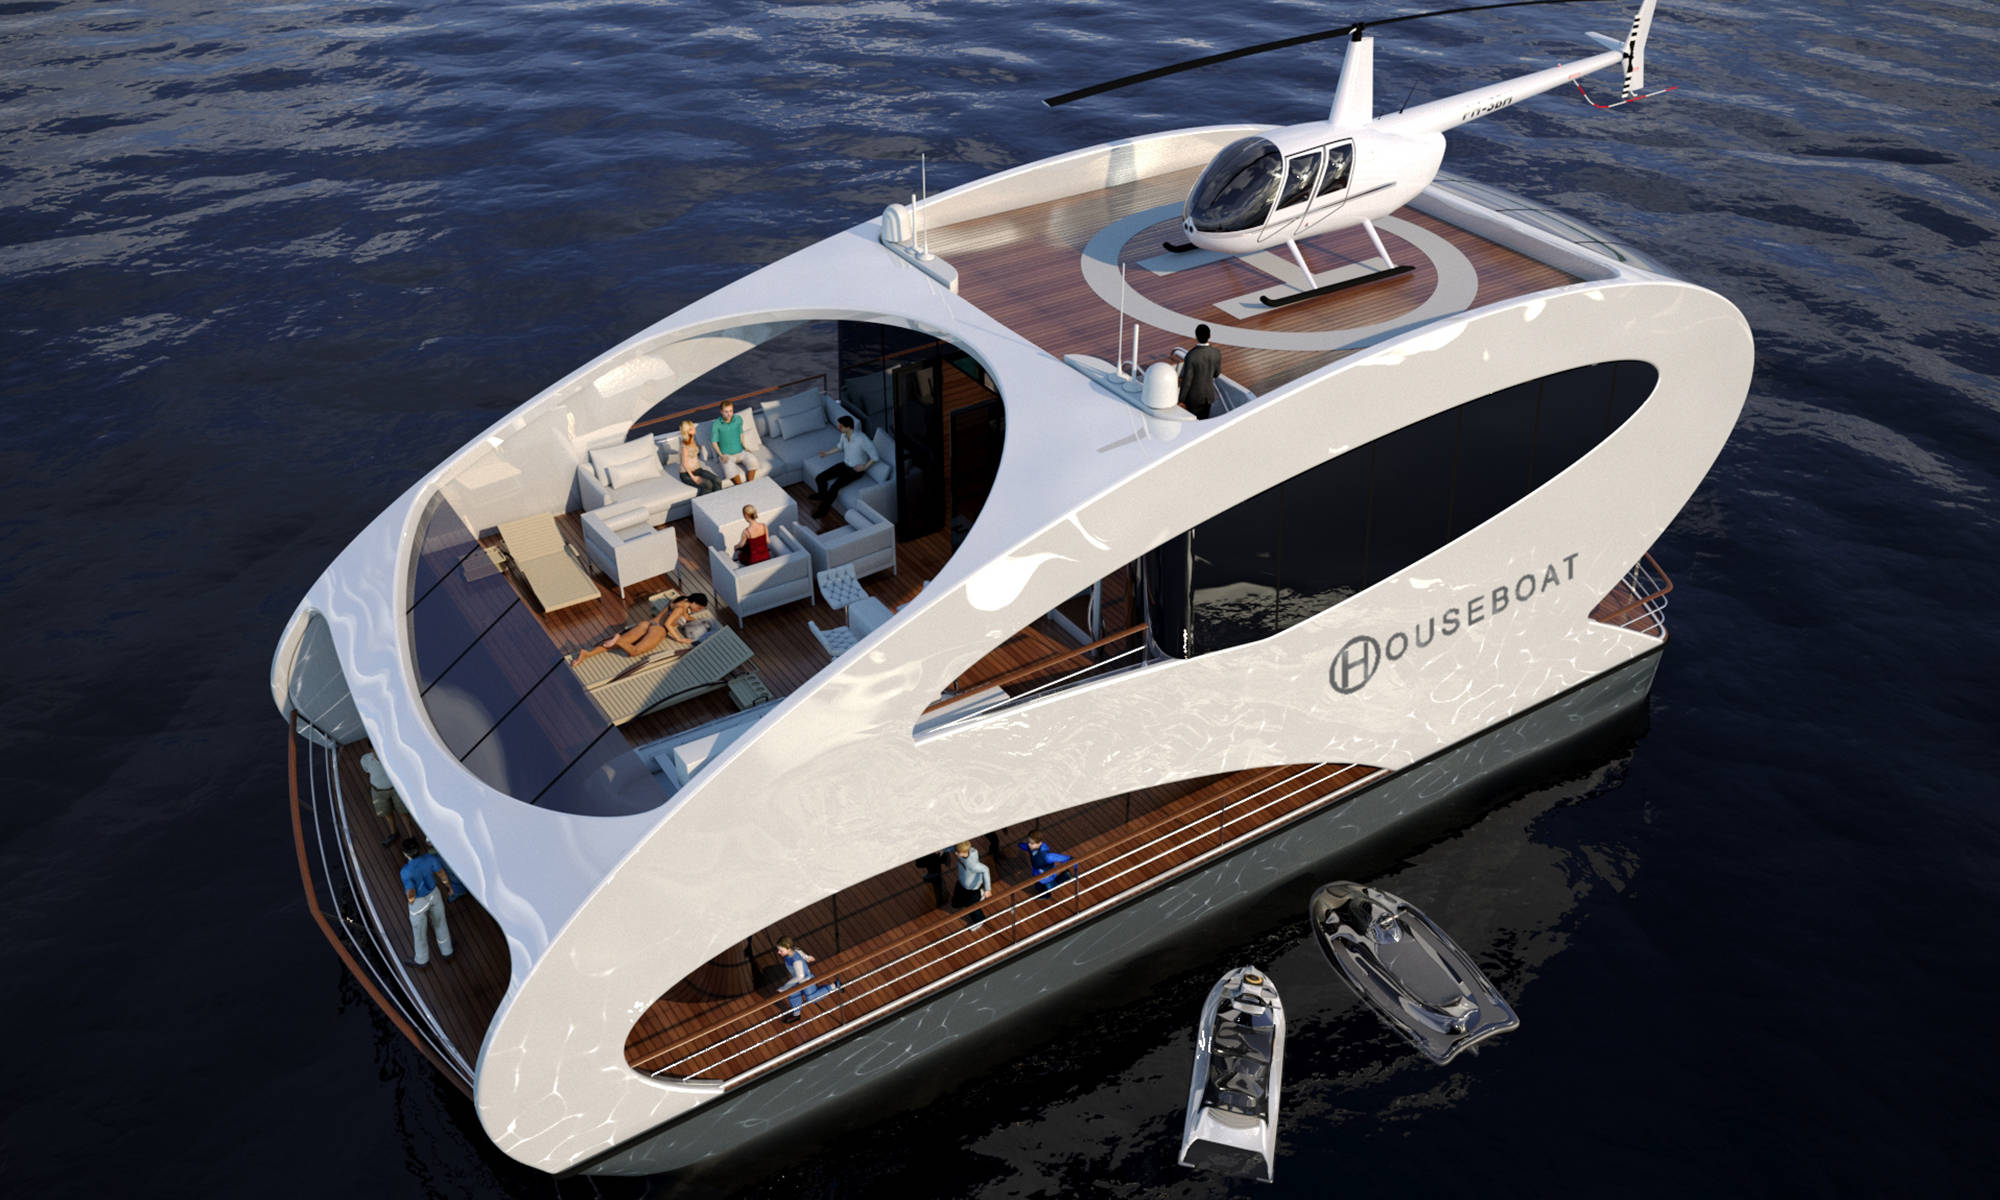 http://houseboat.ru/wp-content/uploads/2016/09/8-2.jpg